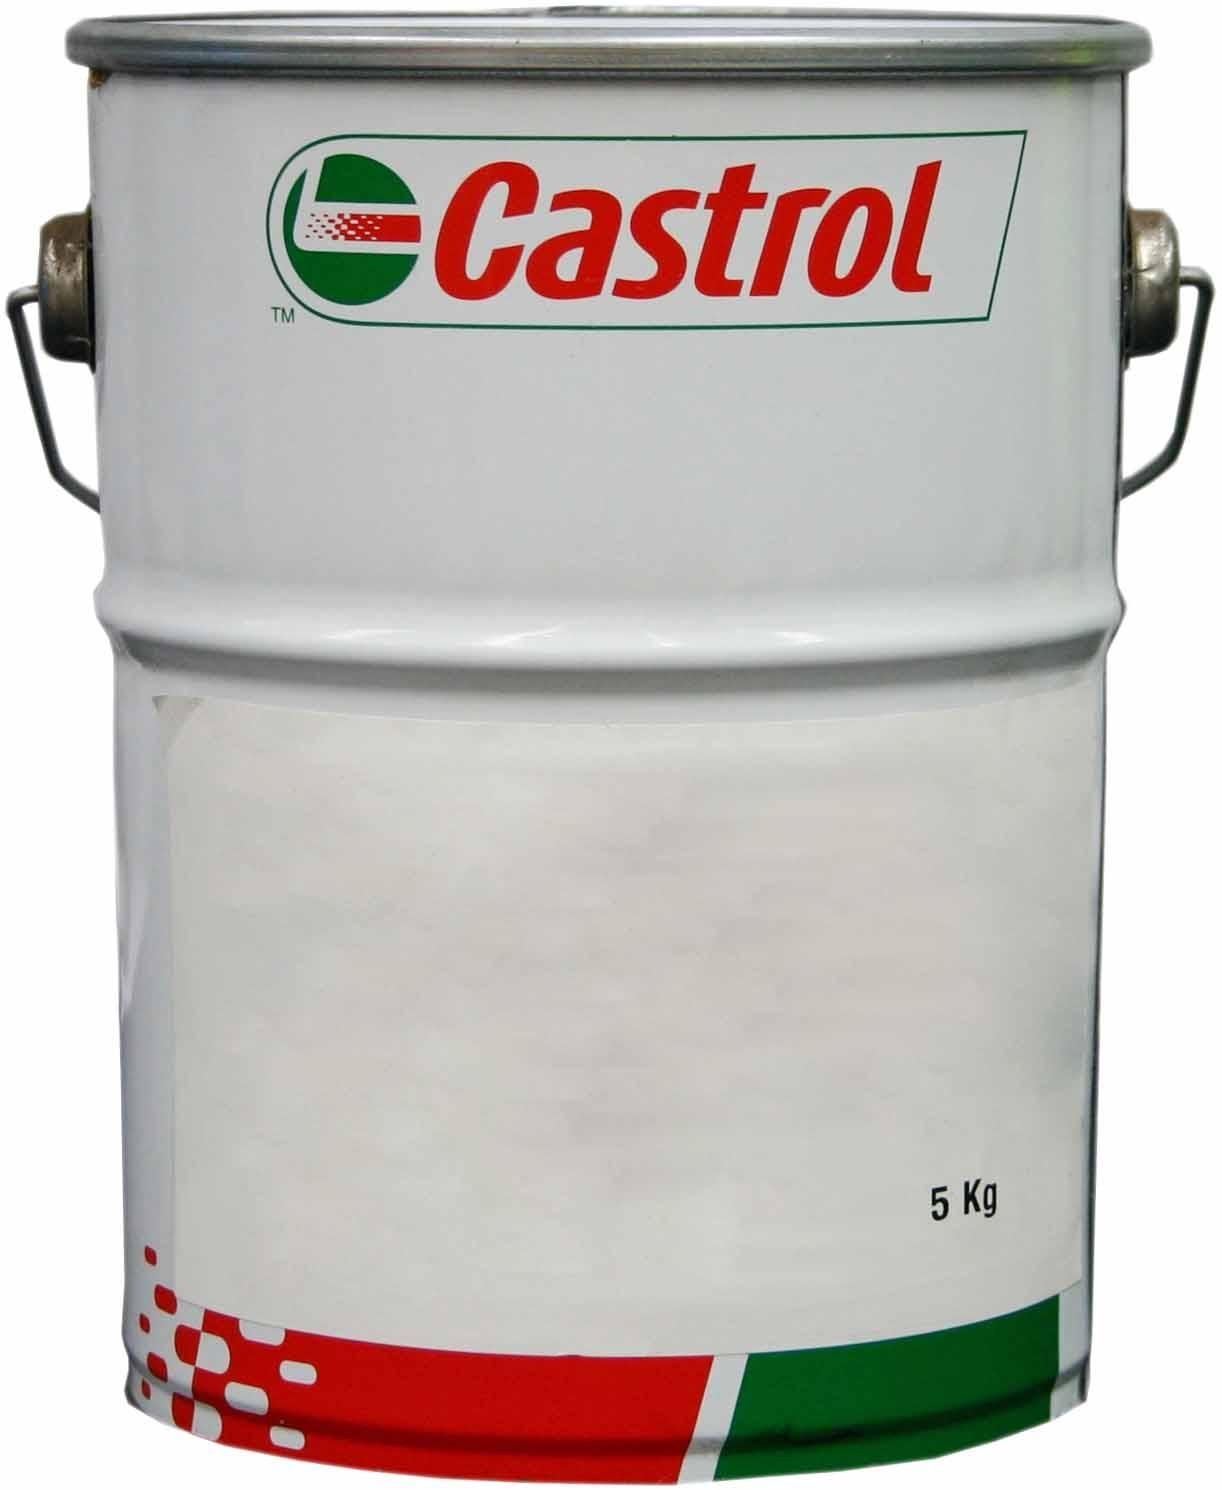 castrol_envase_5kg.jpg